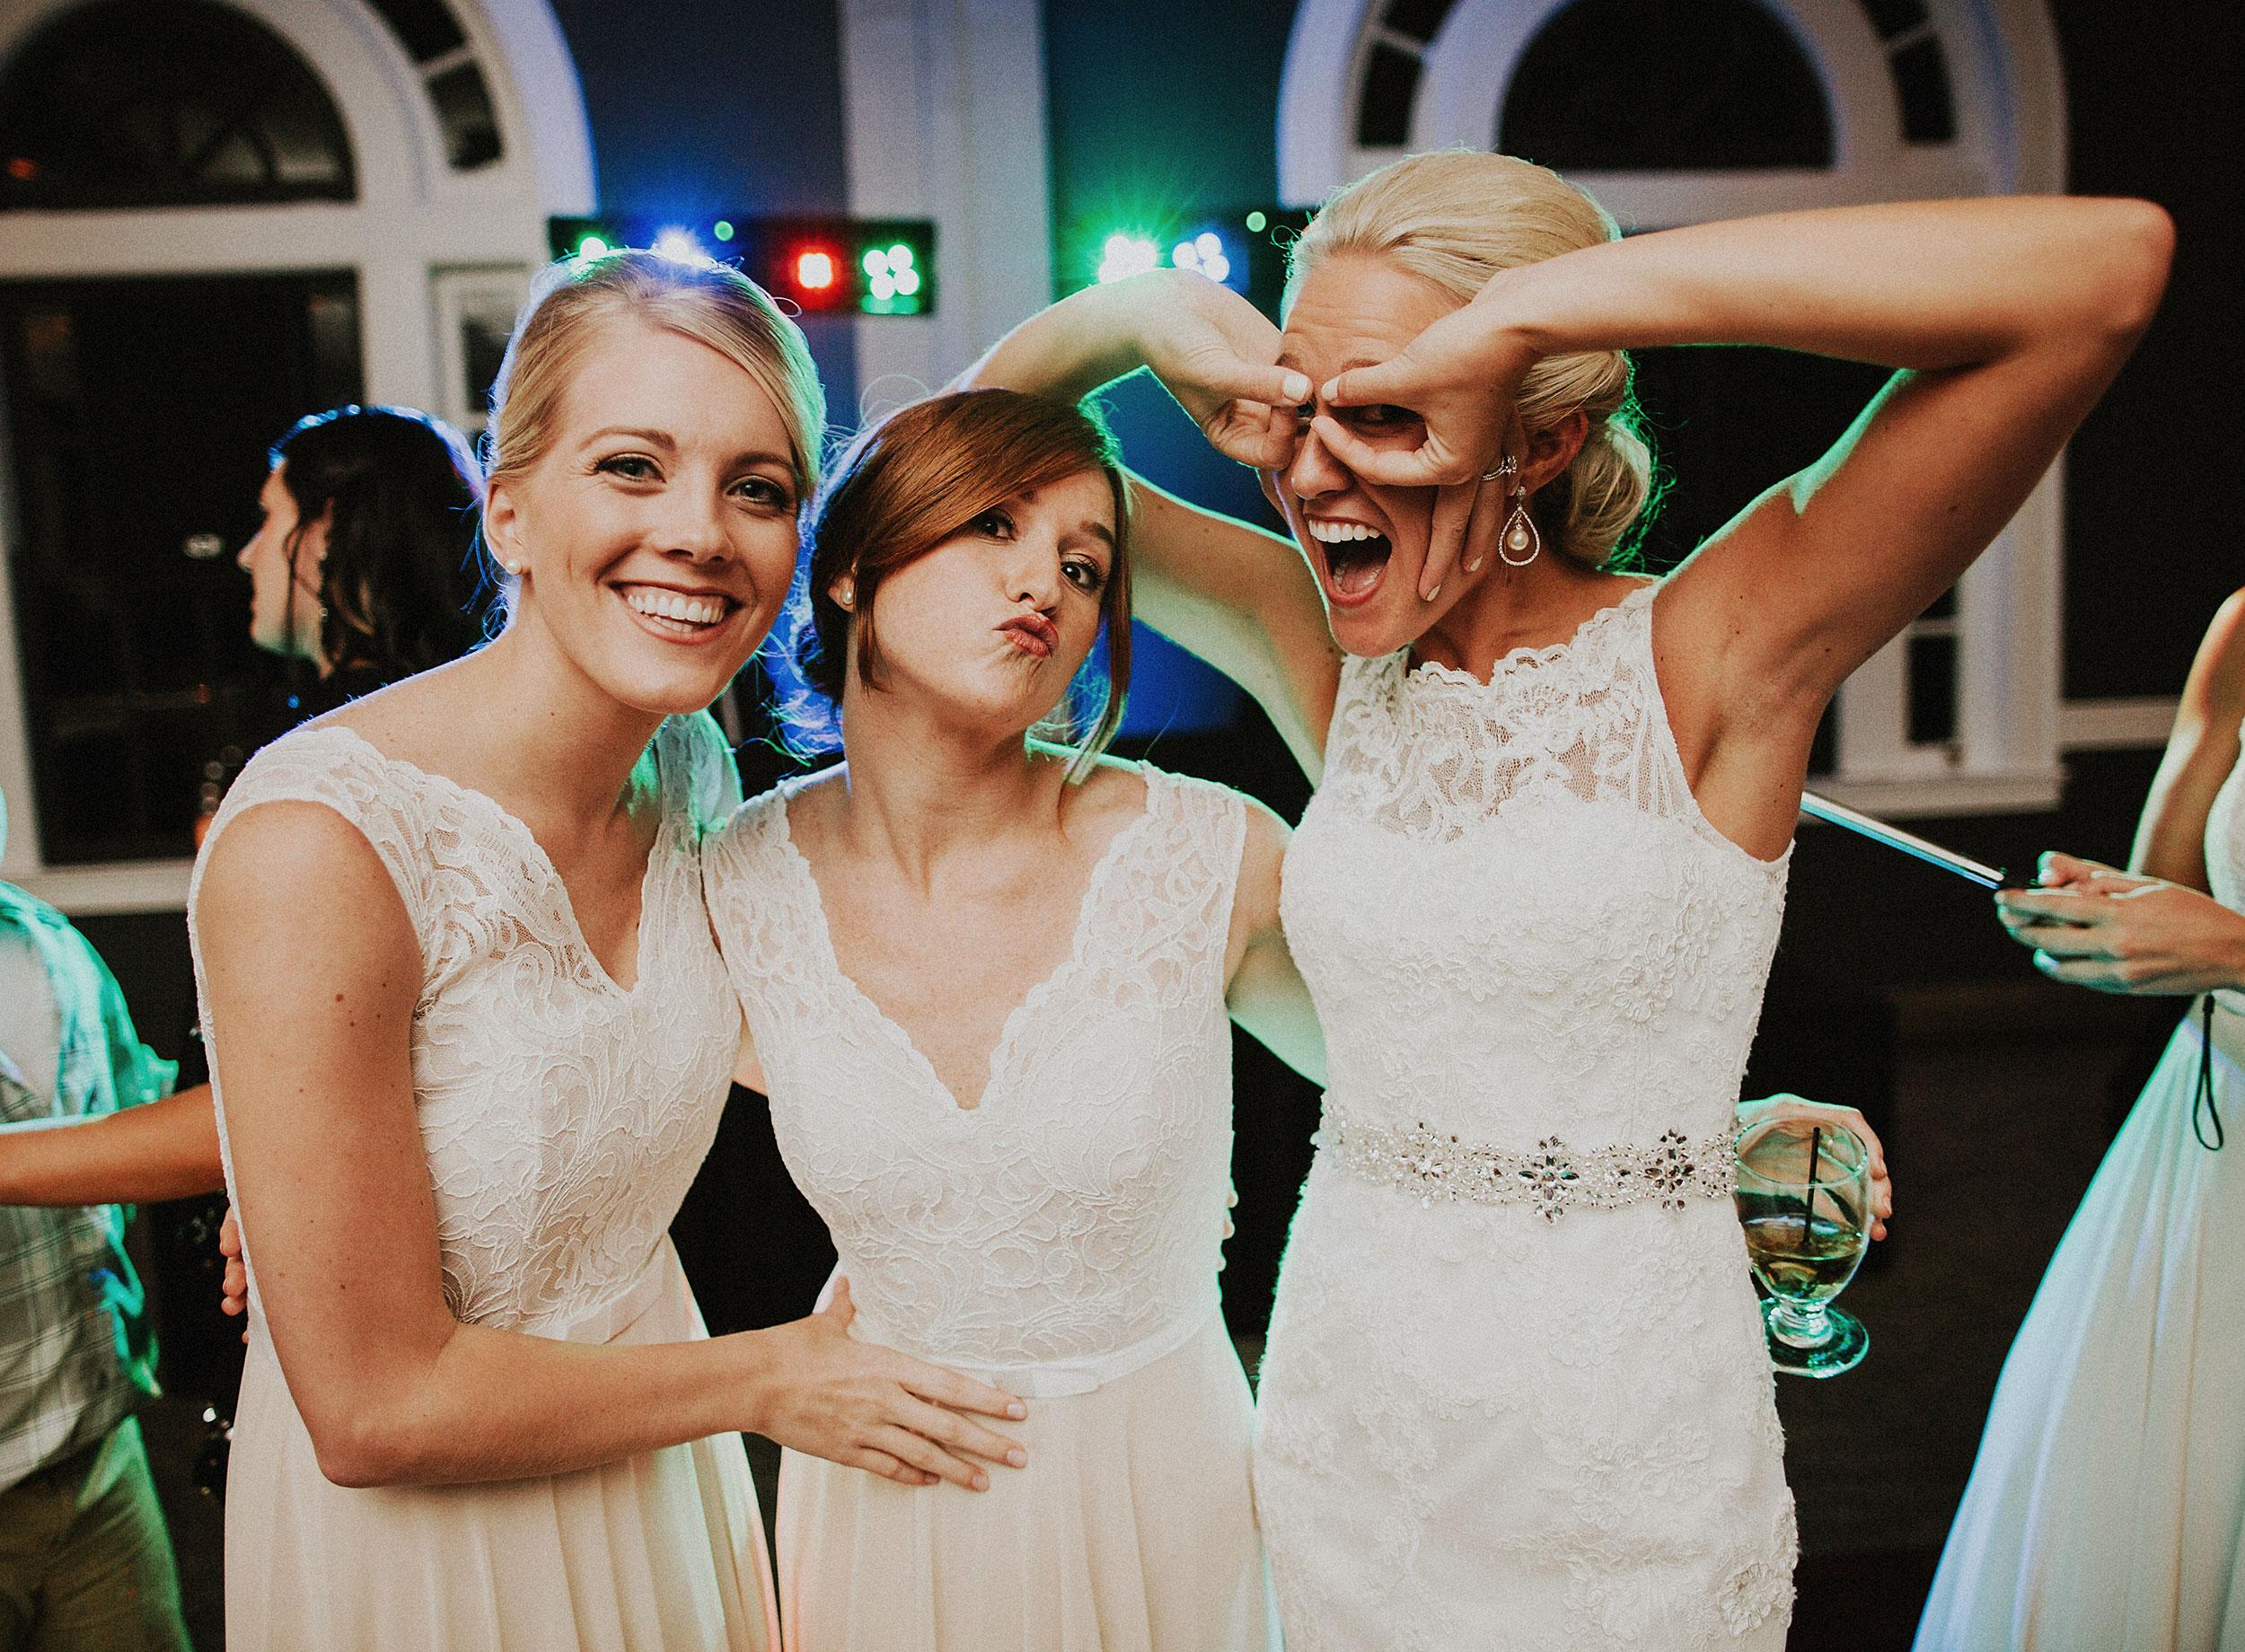 olmsted-wedding-louisville-kentucky-045.JPG